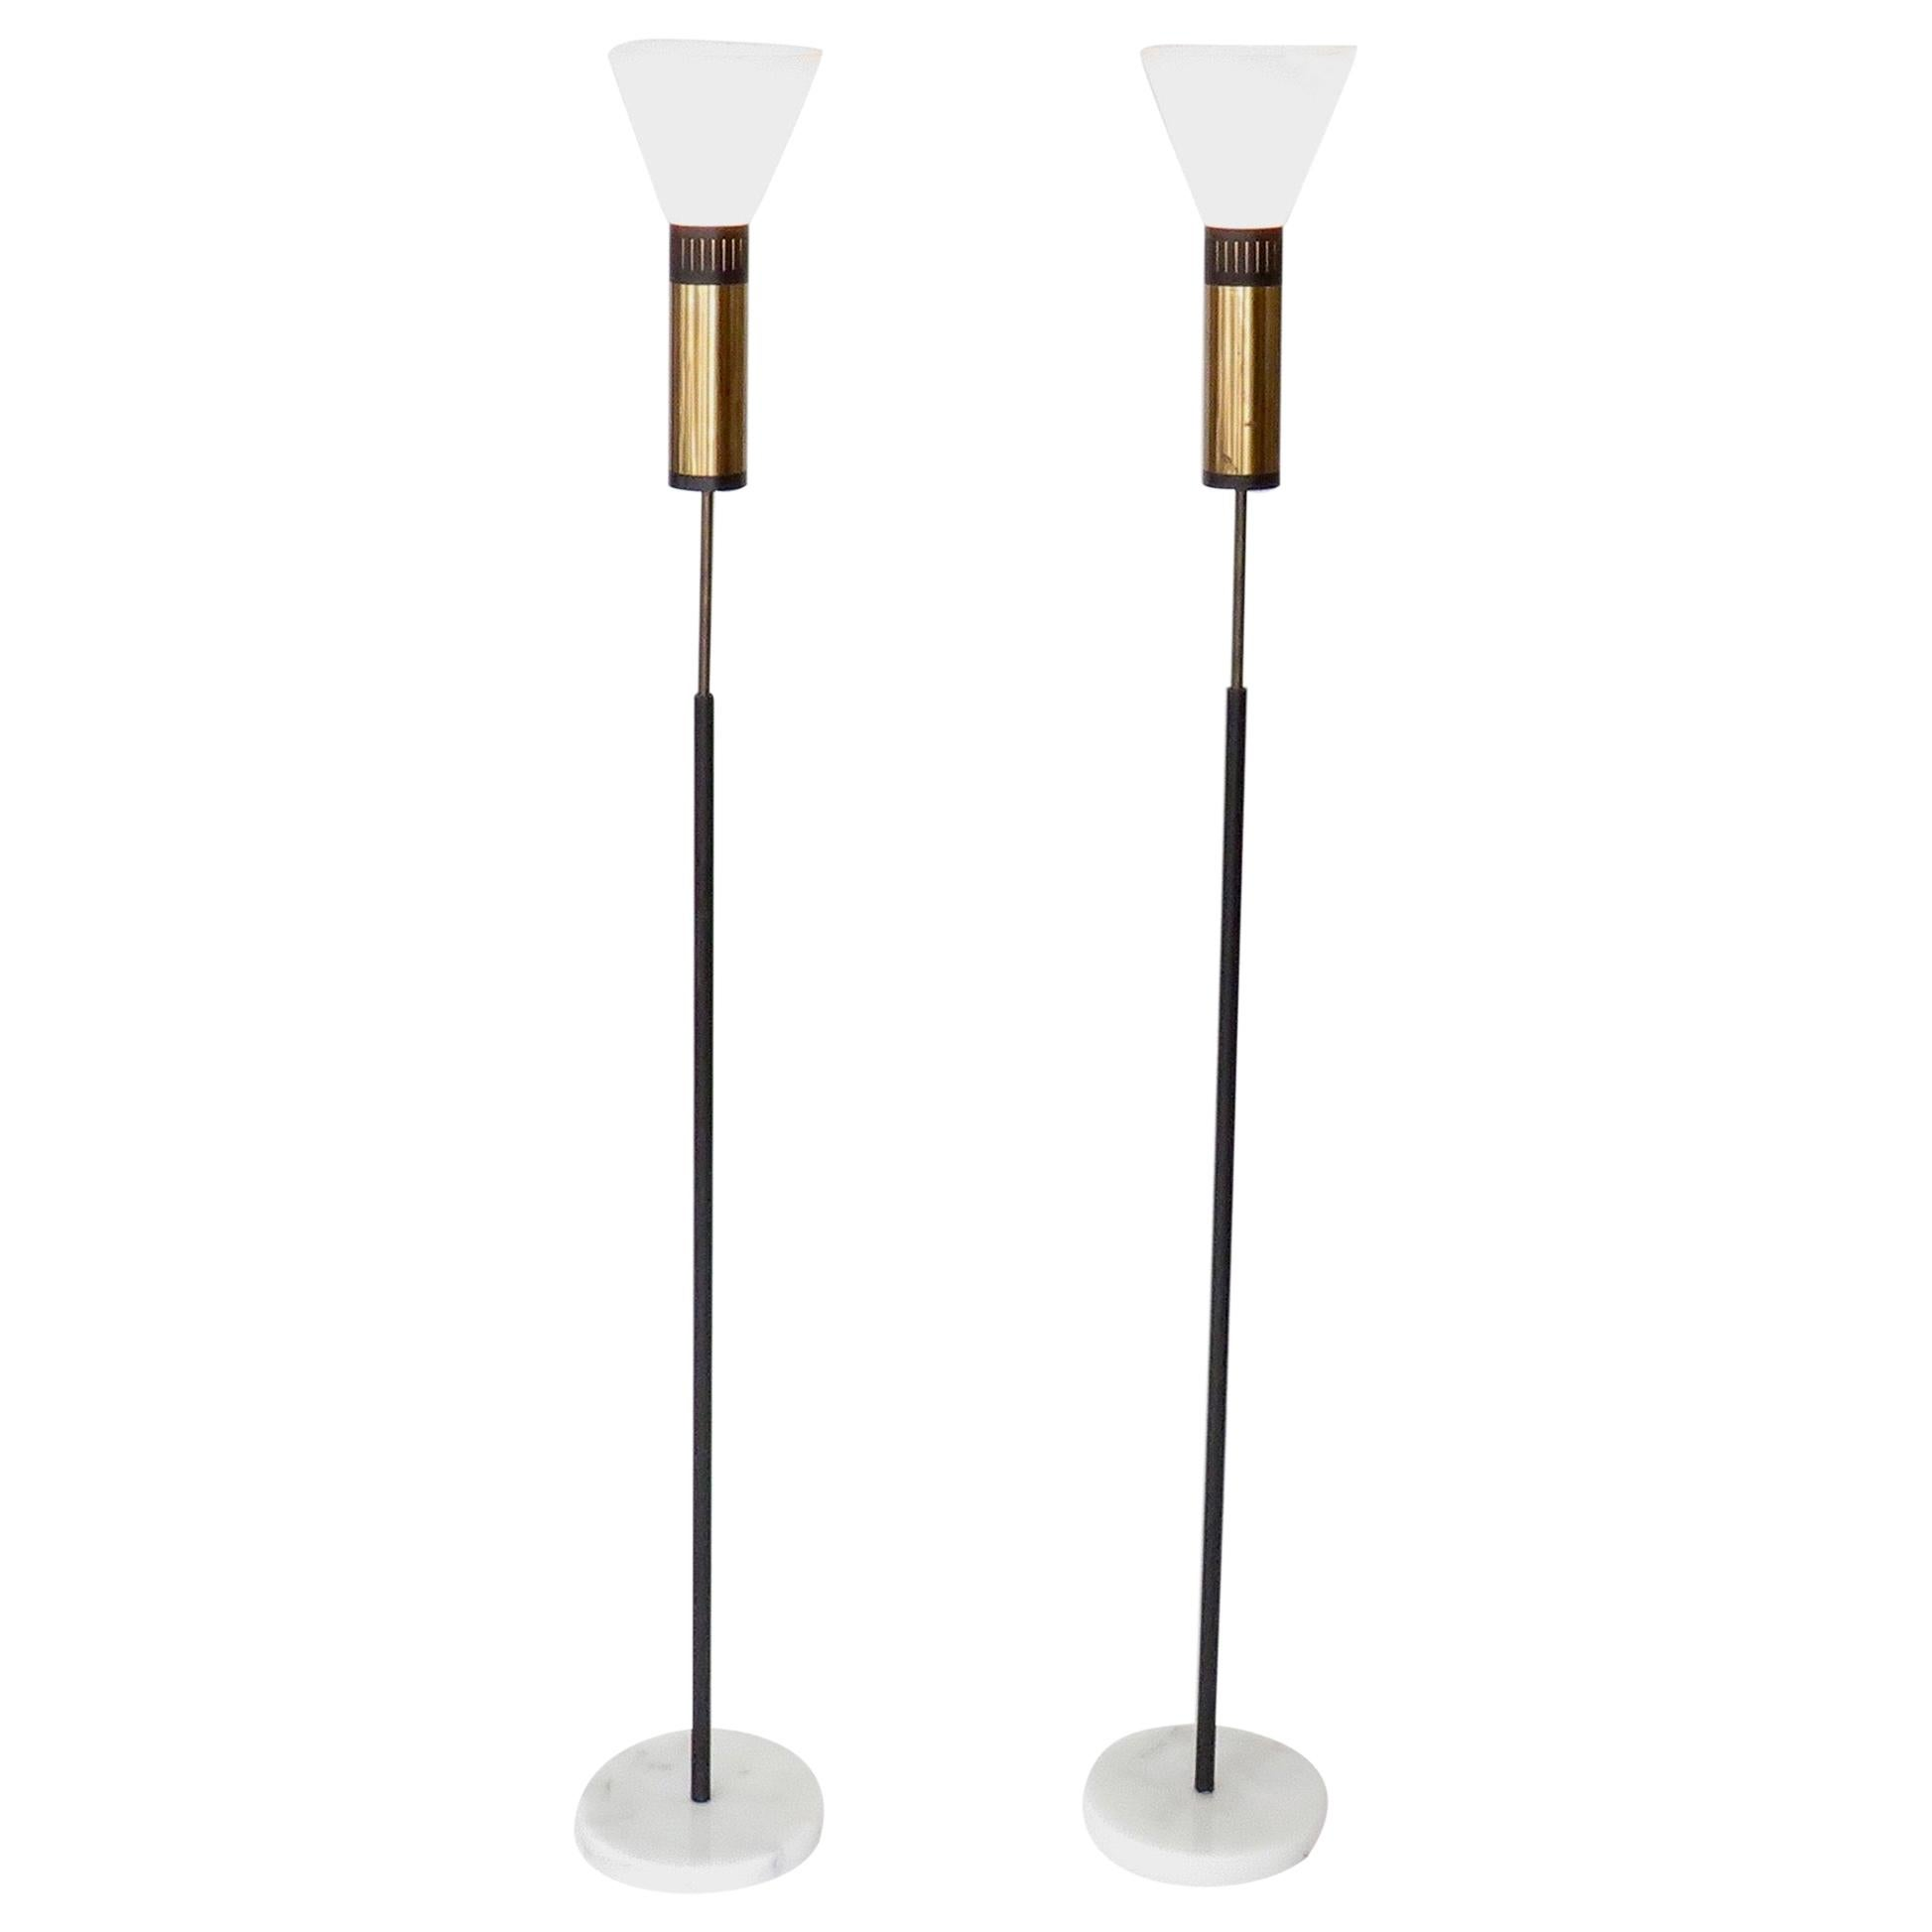 Stilnovo Floor Lamps Glass Diffusers Marble Base Tall Black Enameled Stem Pair